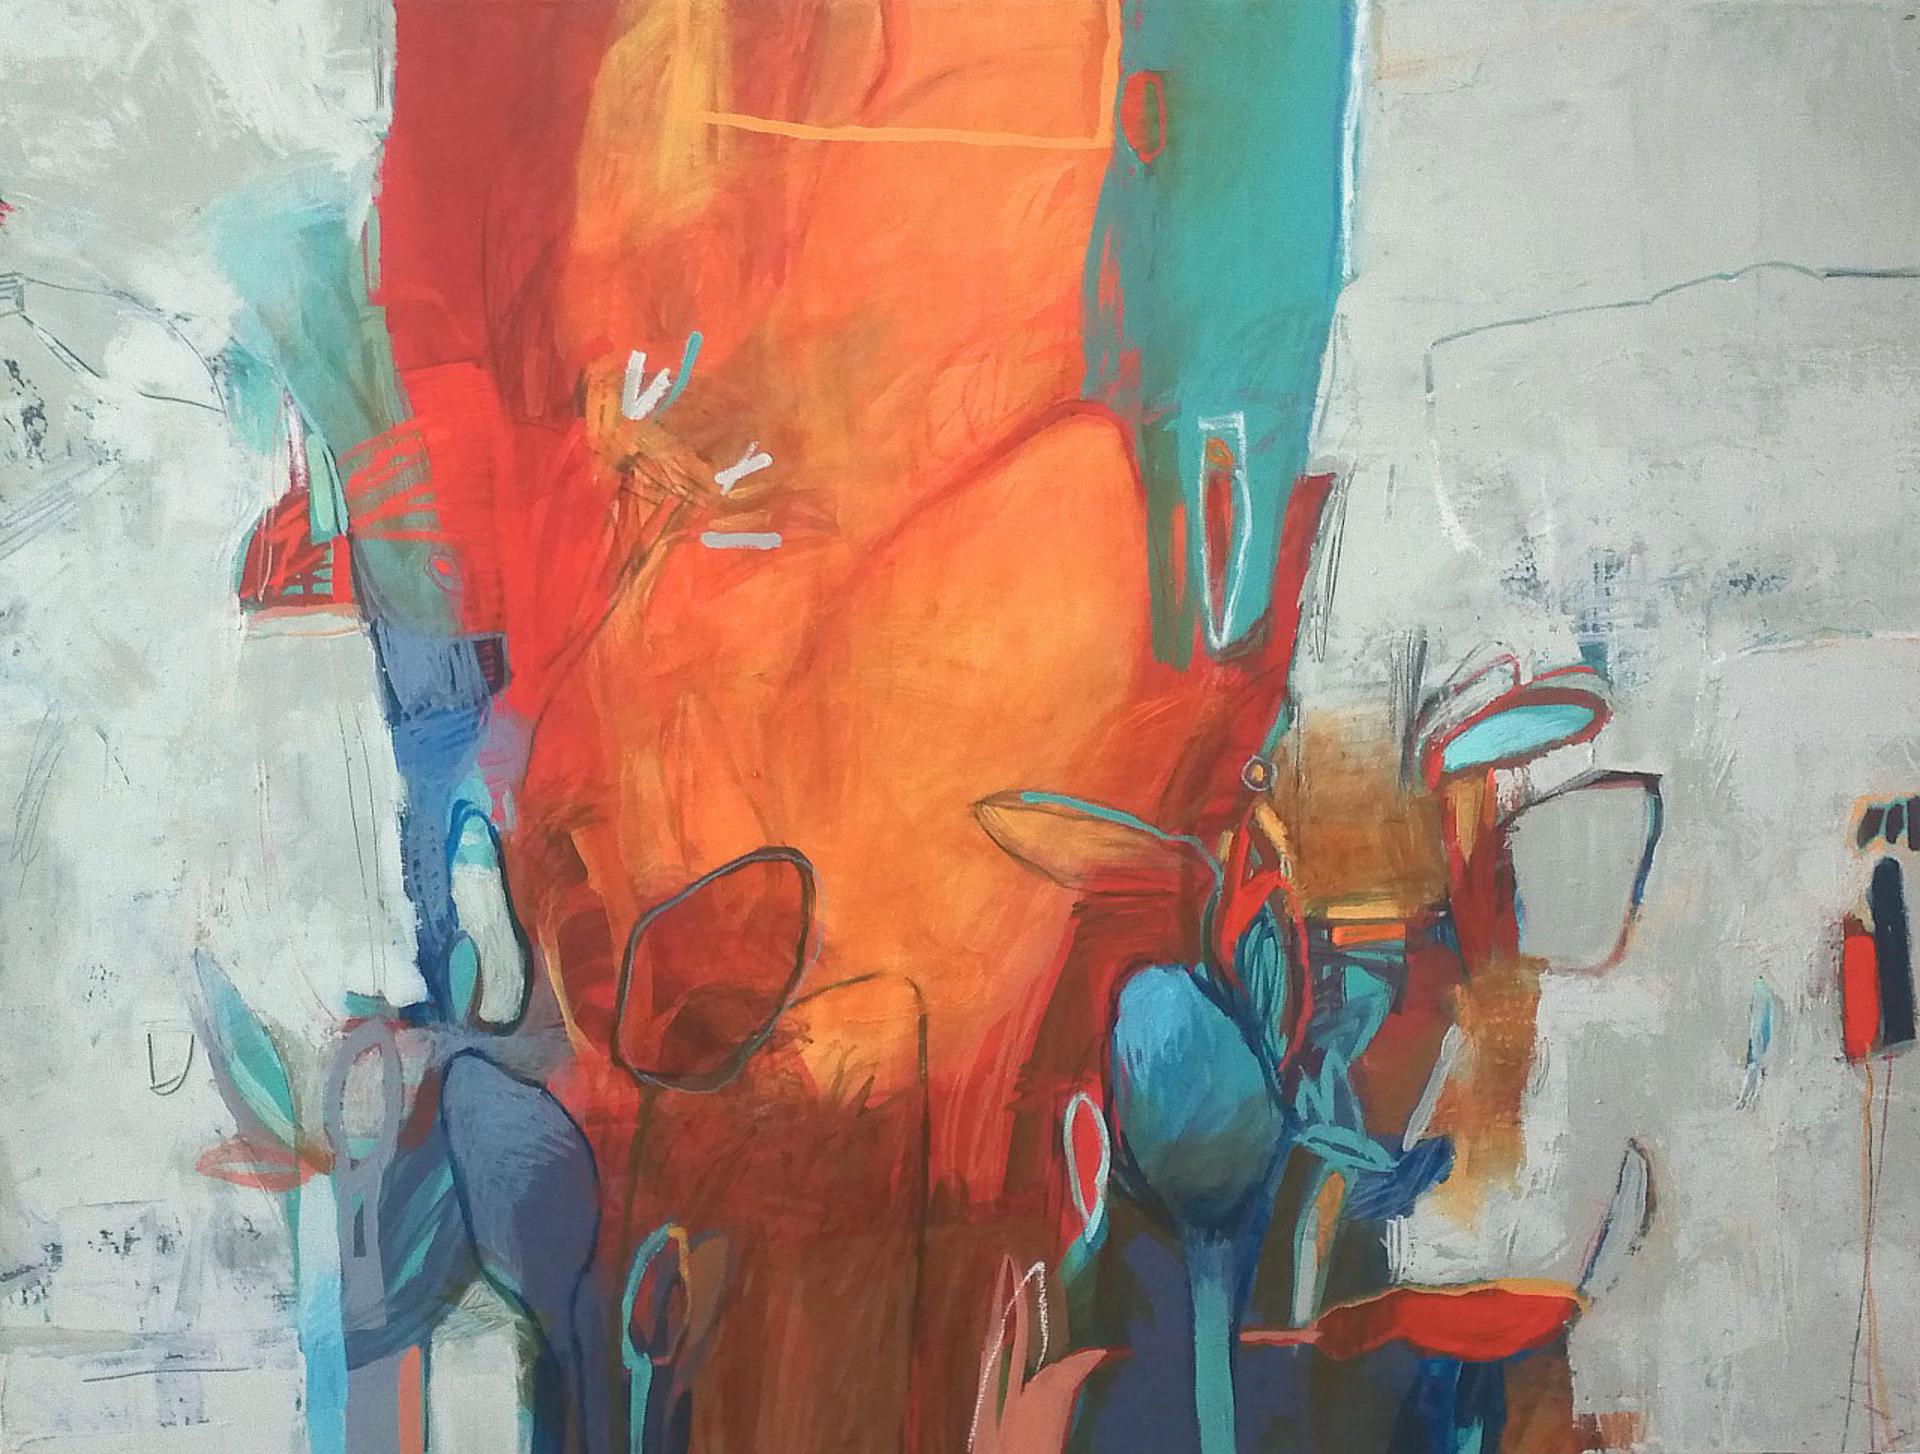 Untitled 142811 by Karen Roehl